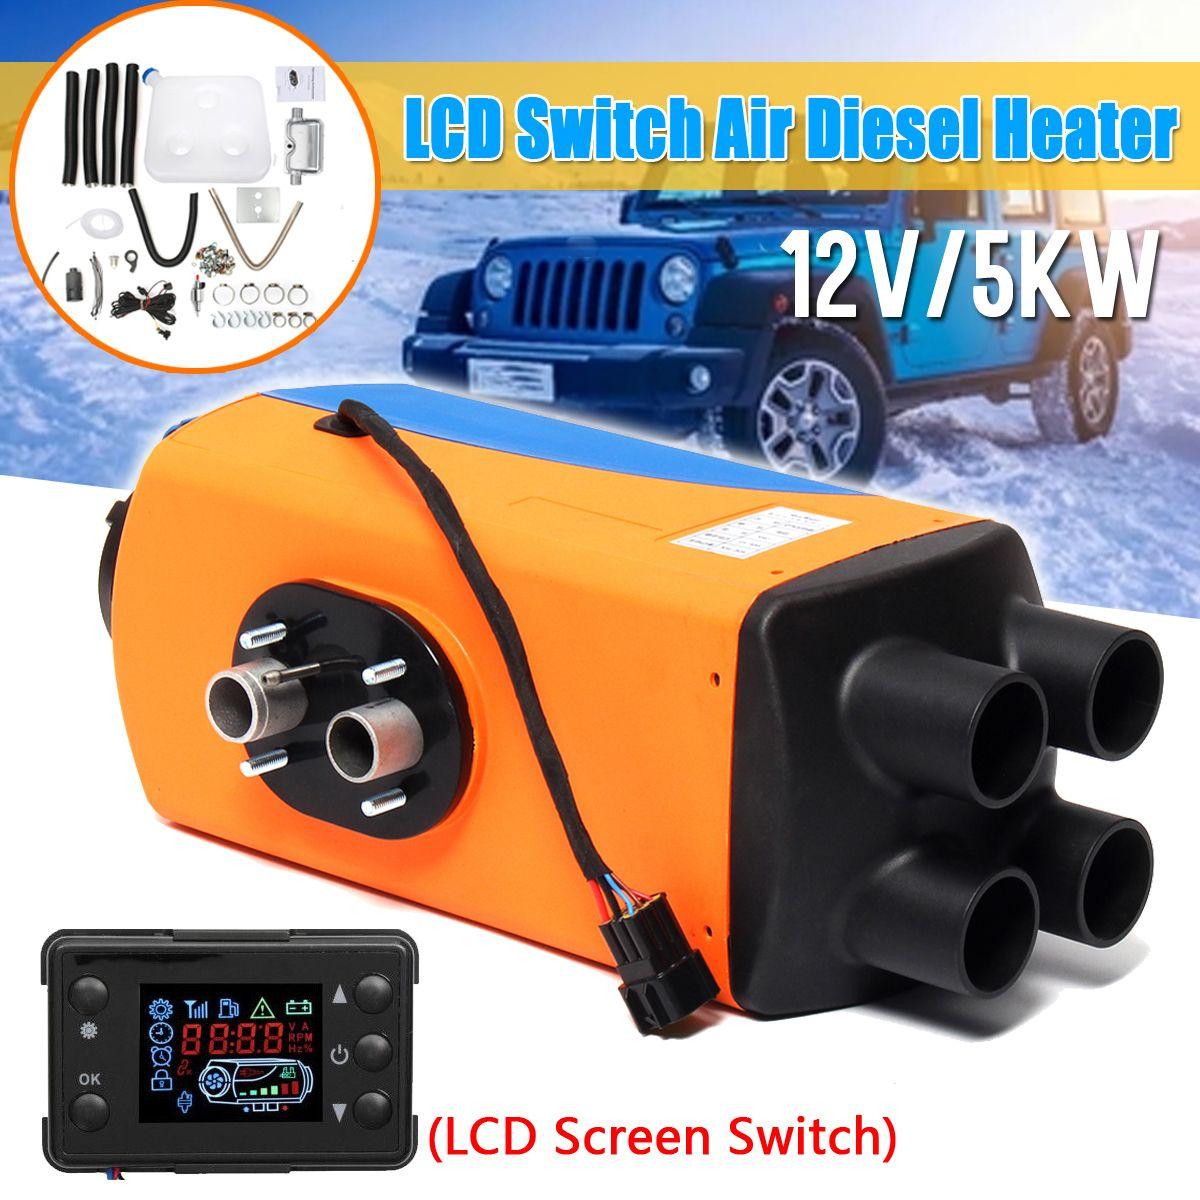 12V/24V 3KW/5KW Air Diesels Heater Parking Heater Diesels Air Heater With Remote LCD Digital Display for Boat Motorhome Trailer